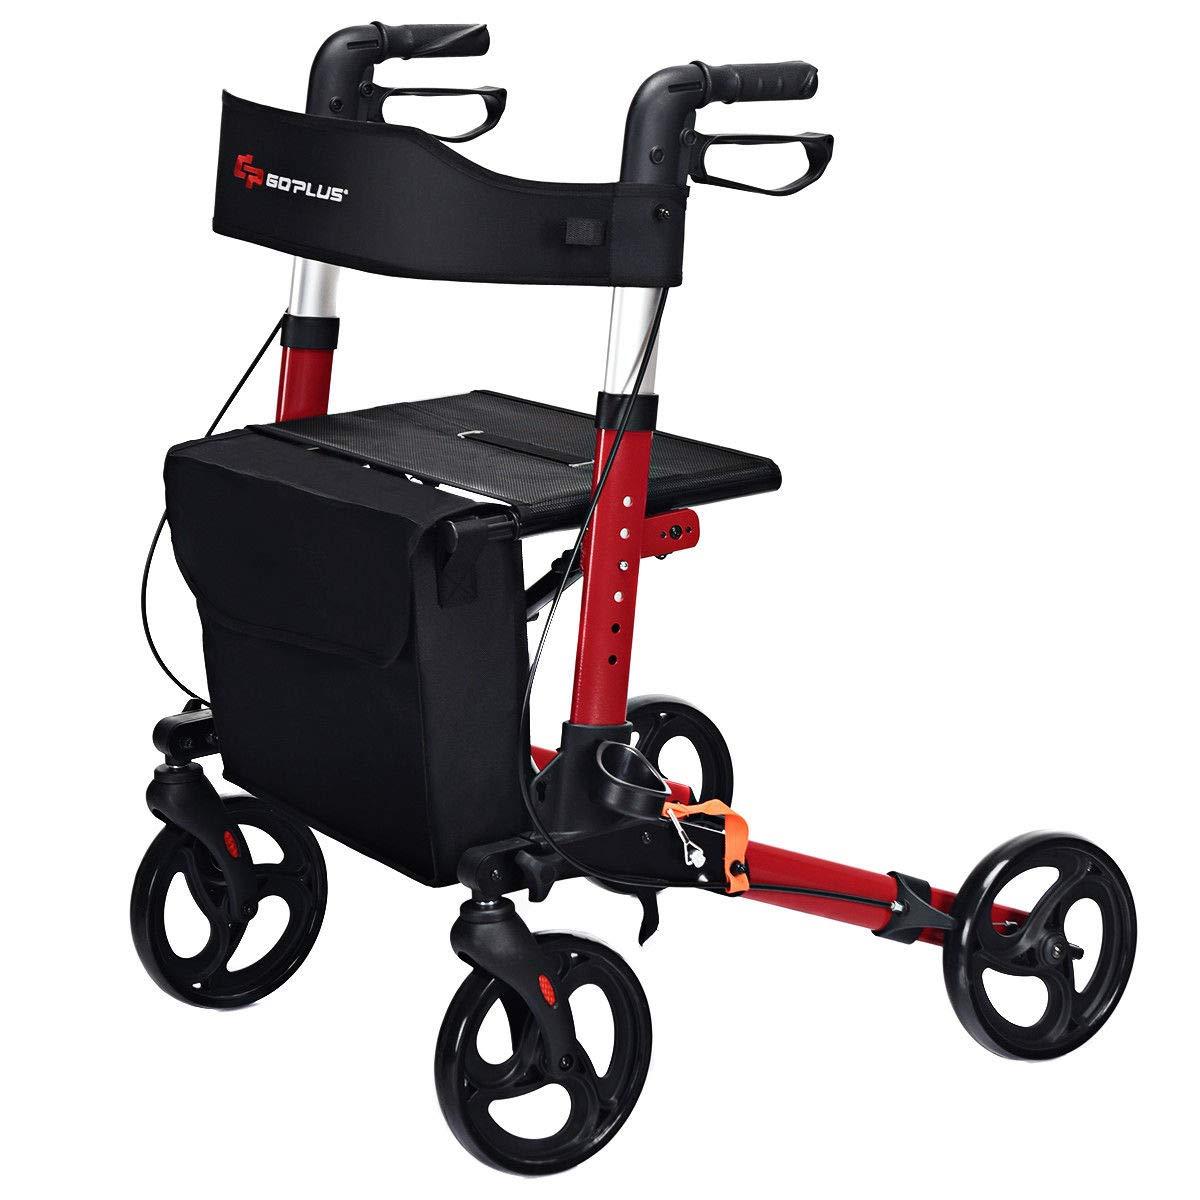 Goplus Folding Rollator Walker, 4 Wheel Medical Rolling Walker with Seat & Bag, Mobility Rollator Lightweight Aluminum Walker with 8'' Wheels for Seniors (Red) by Goplus